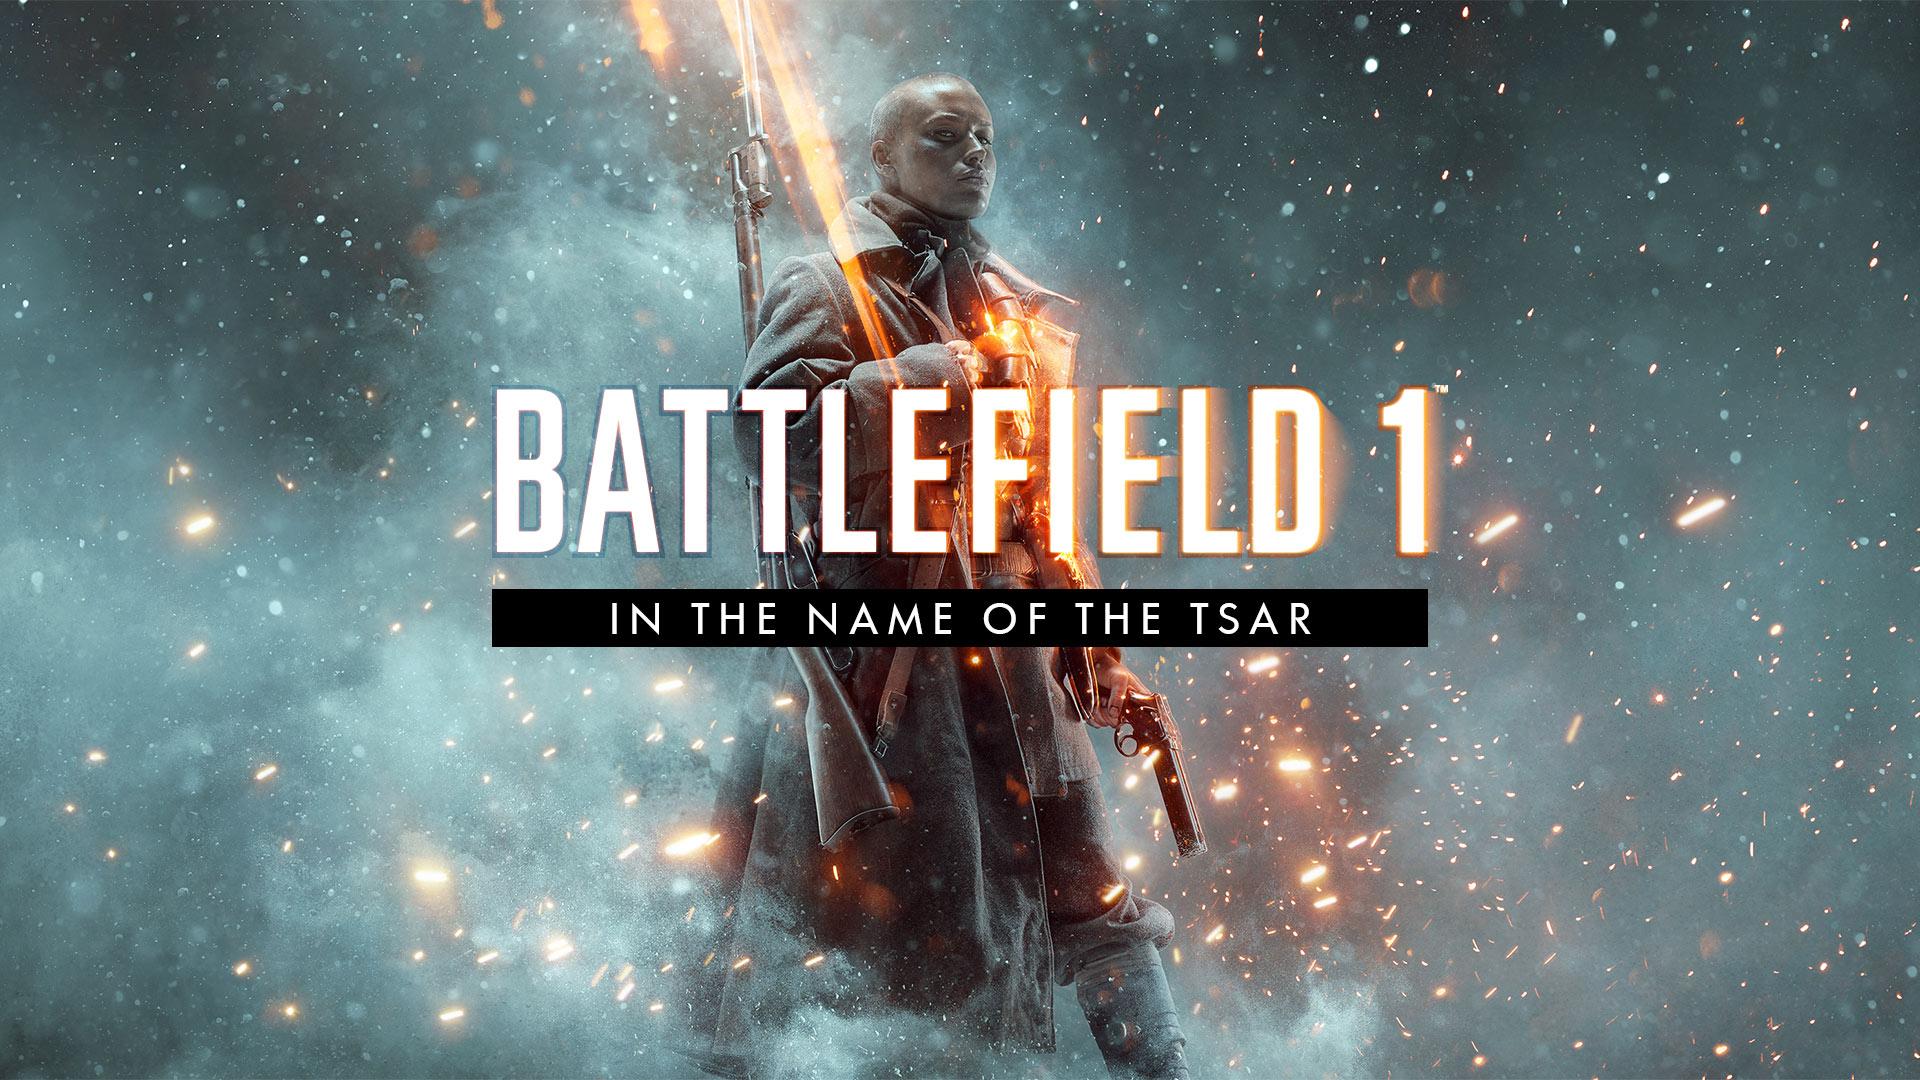 E3 EA Predictions 2017 Battlefield 1